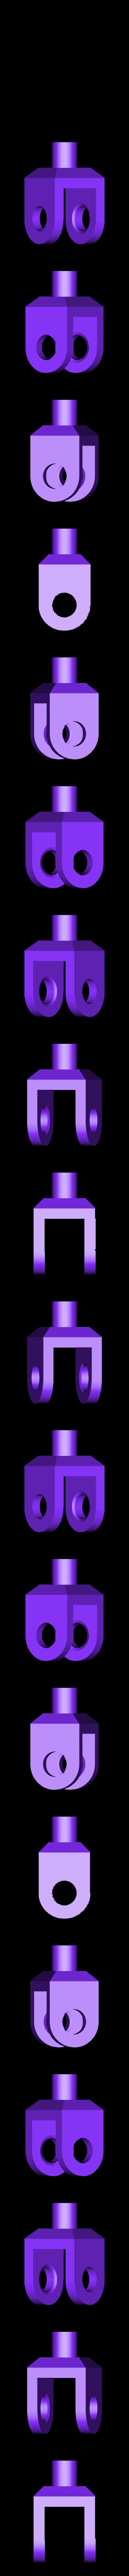 pin_clip.stl Download free STL file ChainClip Construction Set • 3D print template, ferjerez3d